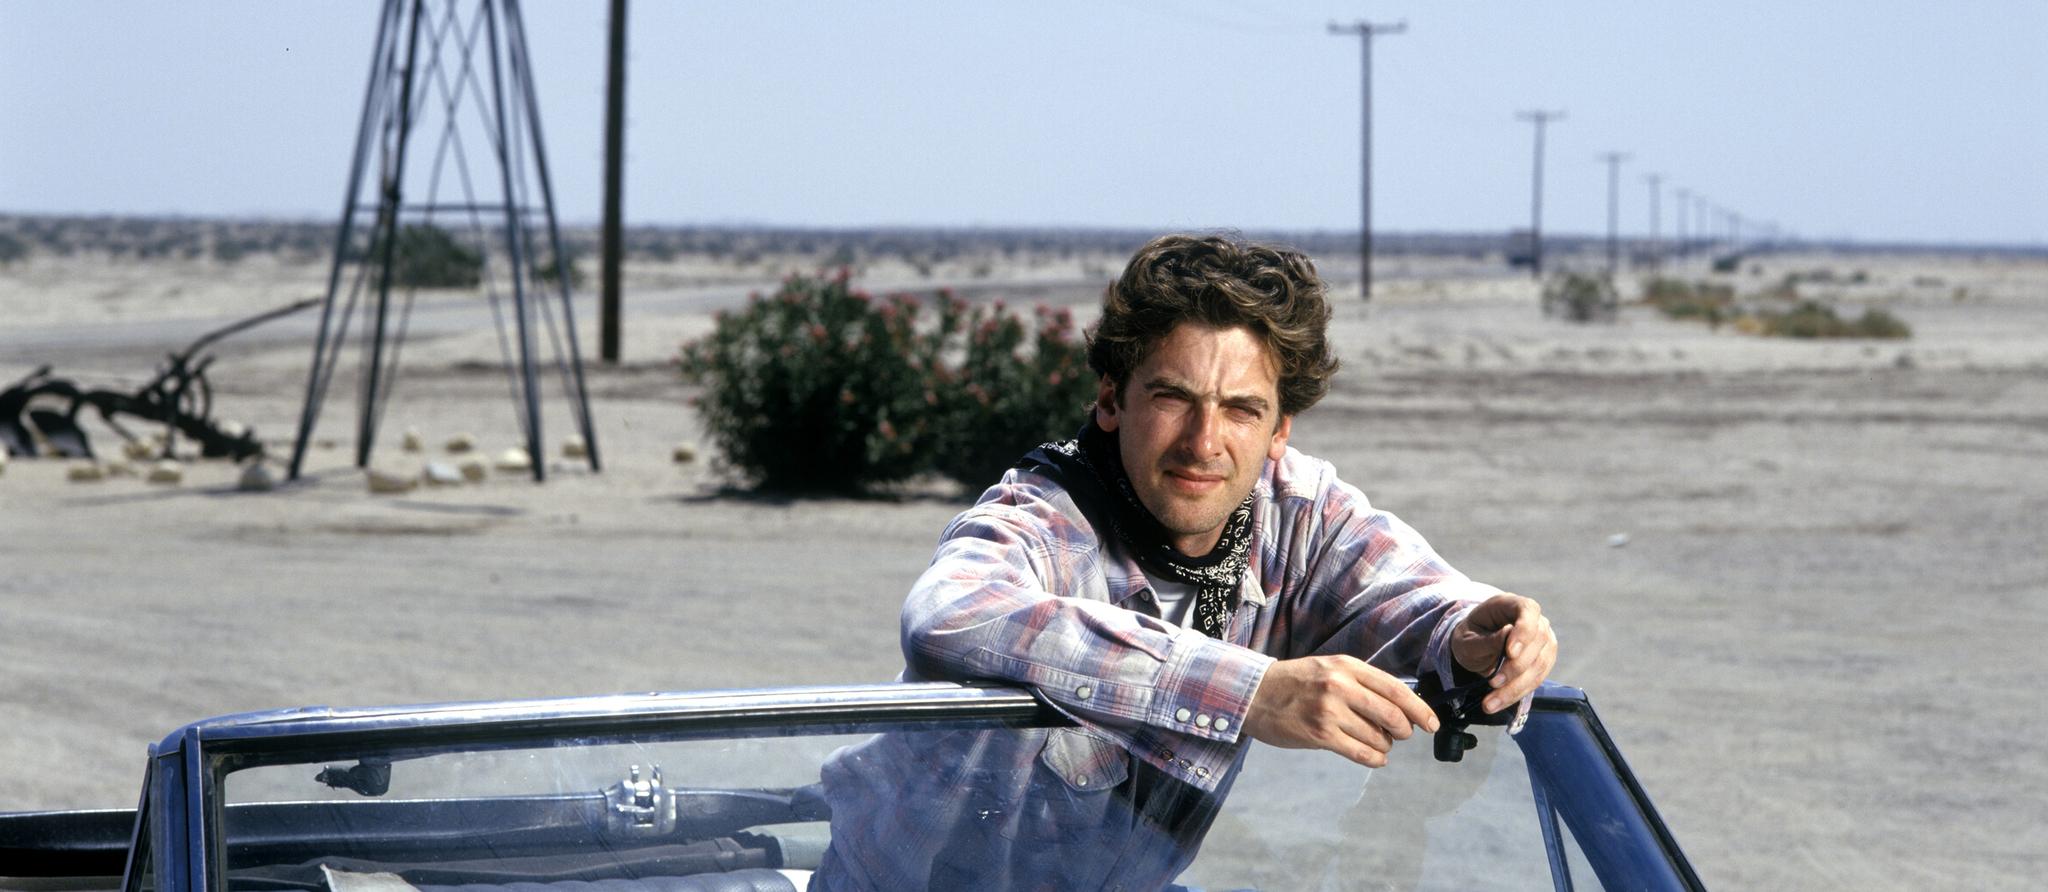 Peter Capaldi in Runway One (1995)